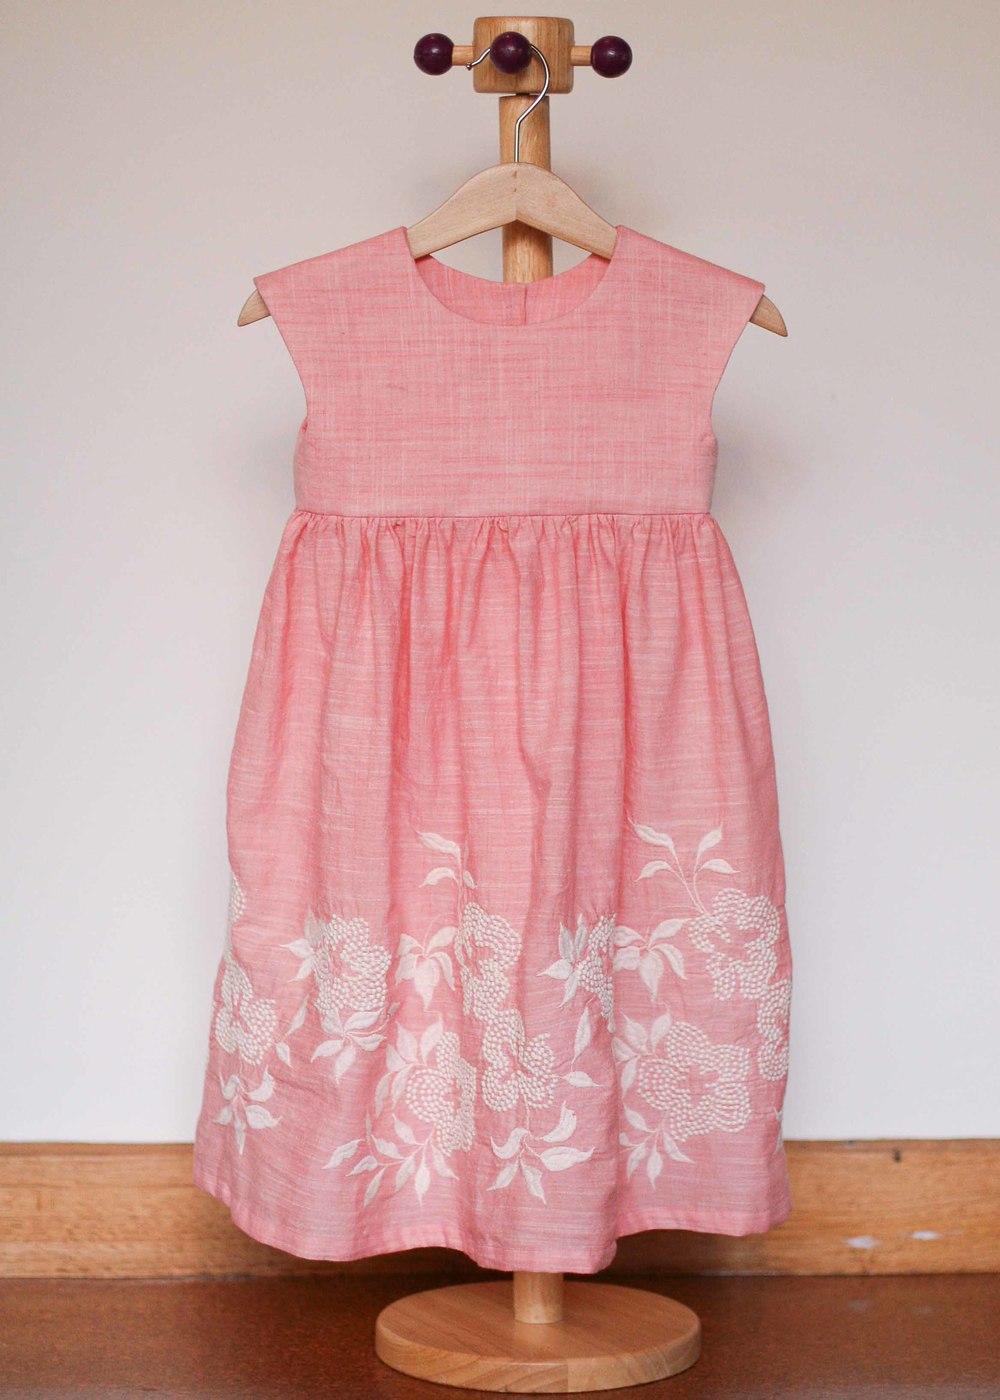 3rd birthday dress